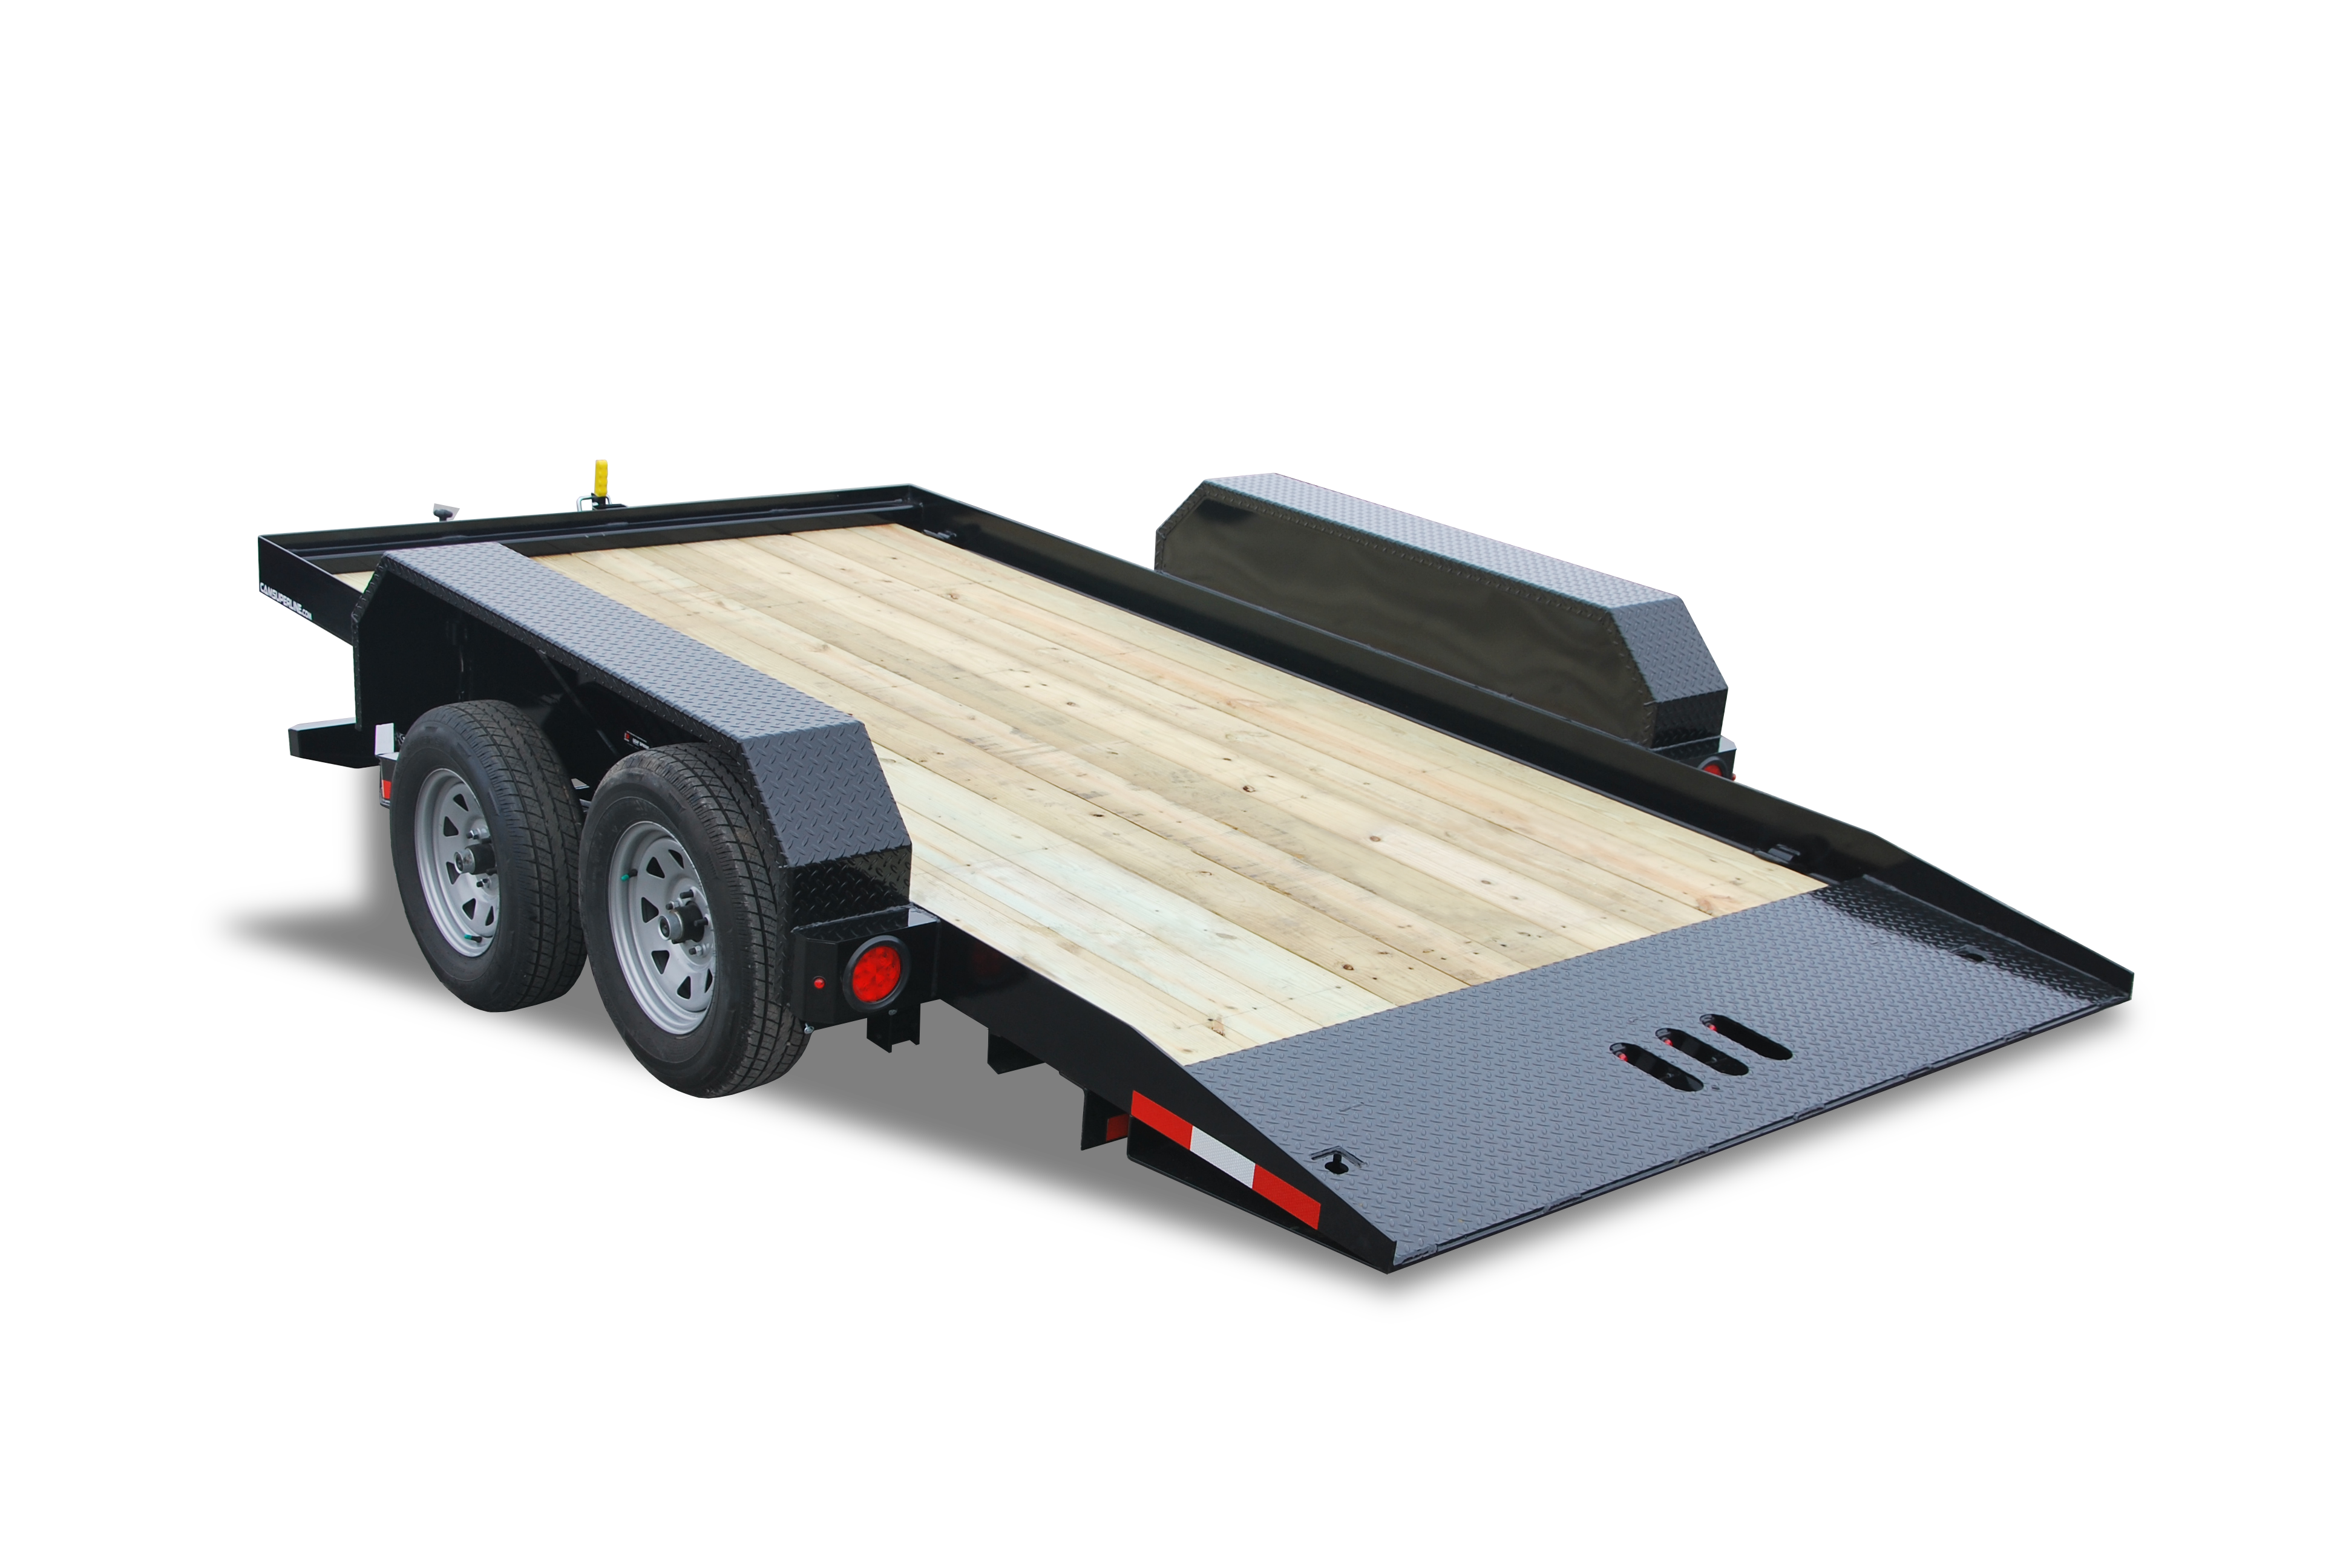 2021 Cam Superline 5 Ton 6x14 Tilt Trailer TA